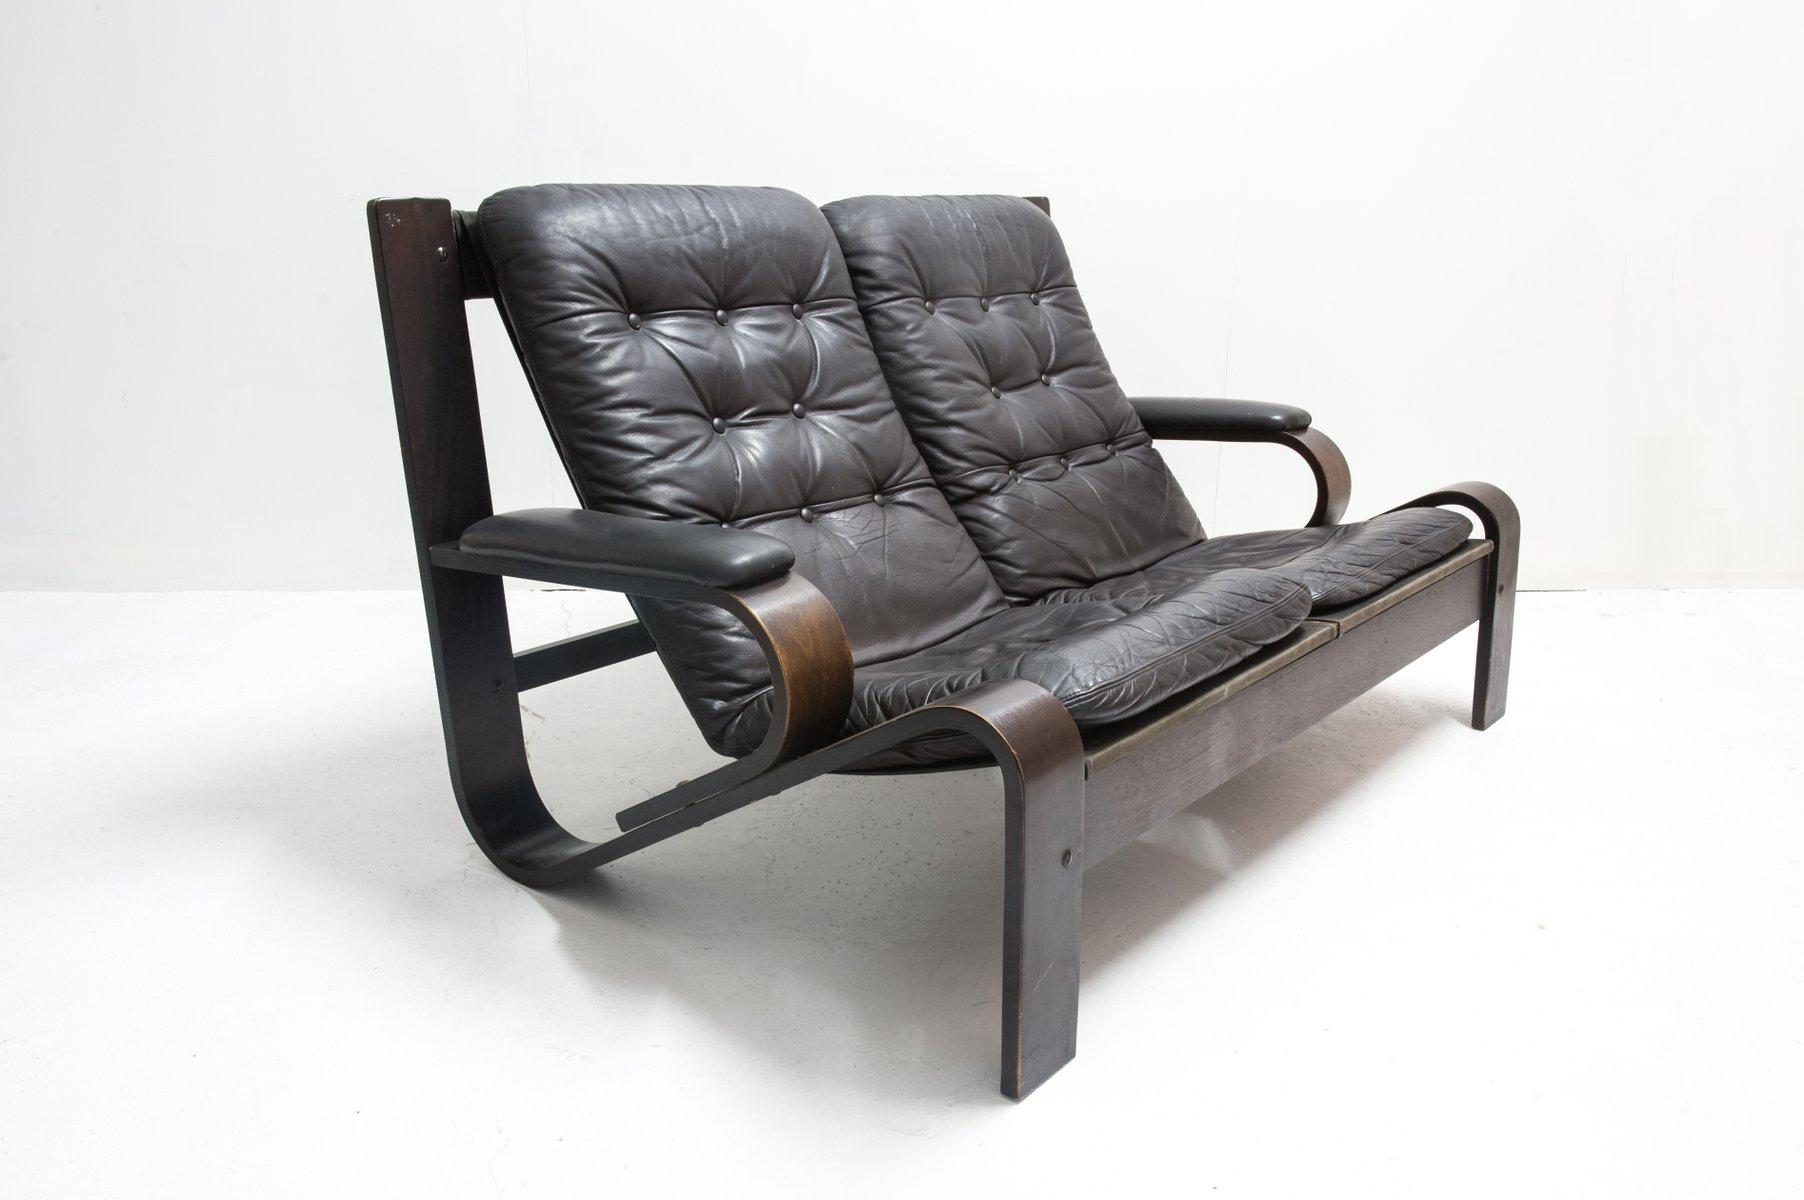 Vintage 2 Sitzer Sofa aus Leder & Holz bei Pamono kaufen